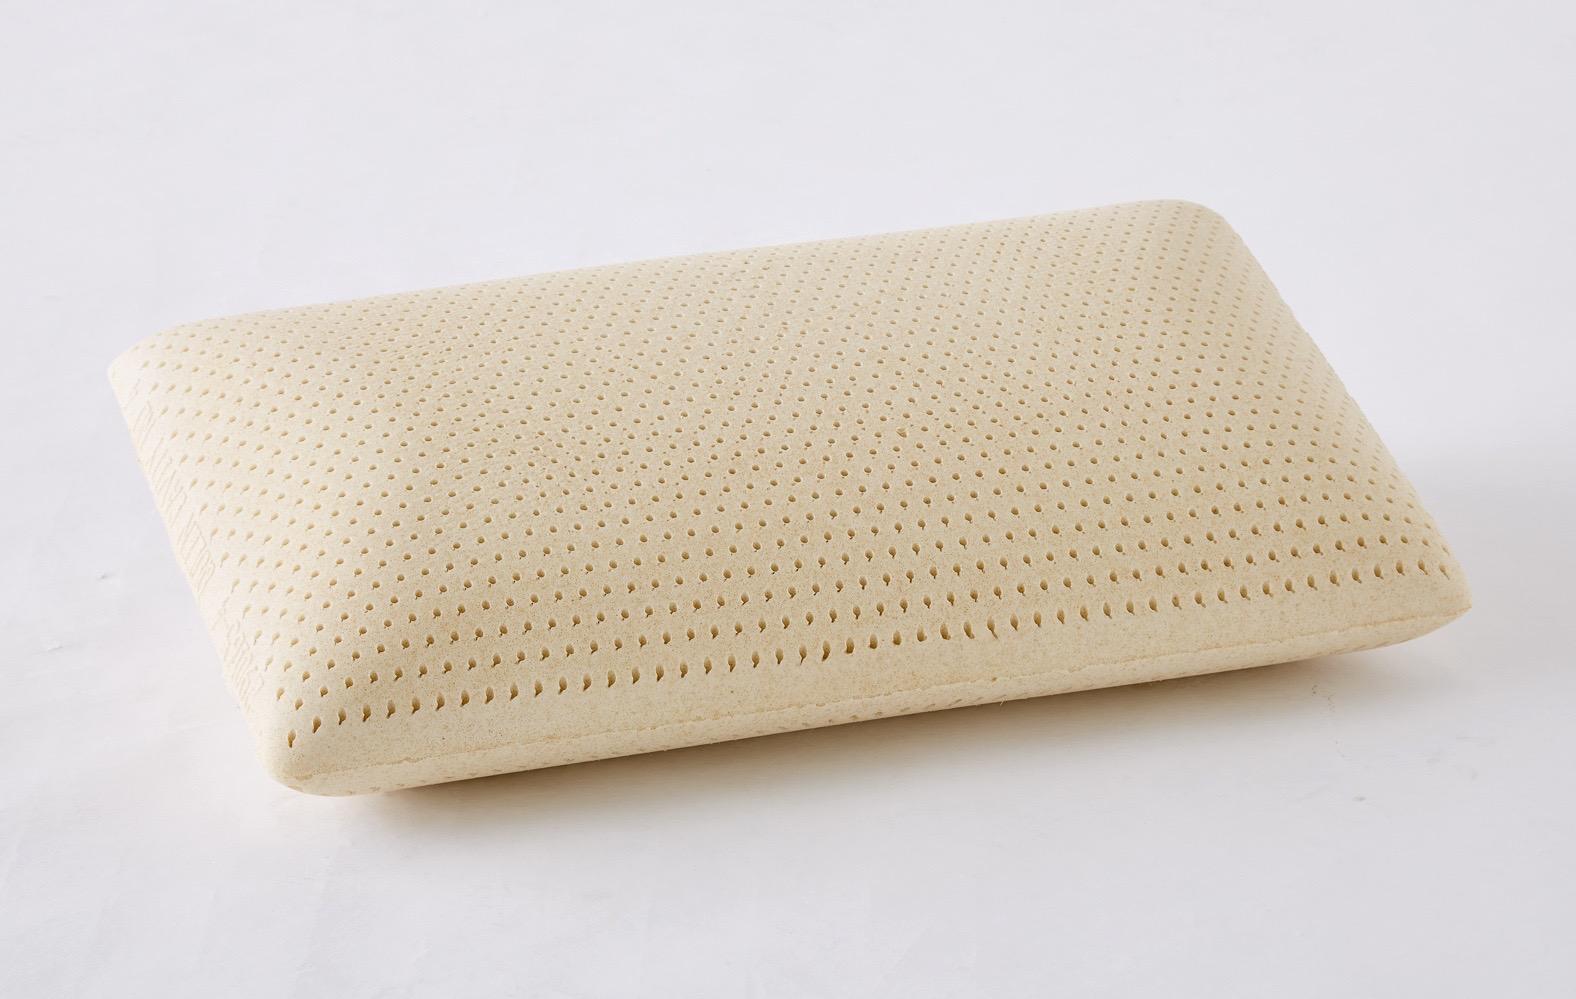 Talalay latex foam pillow - soft, medium, firm dentisy latex fom pillow